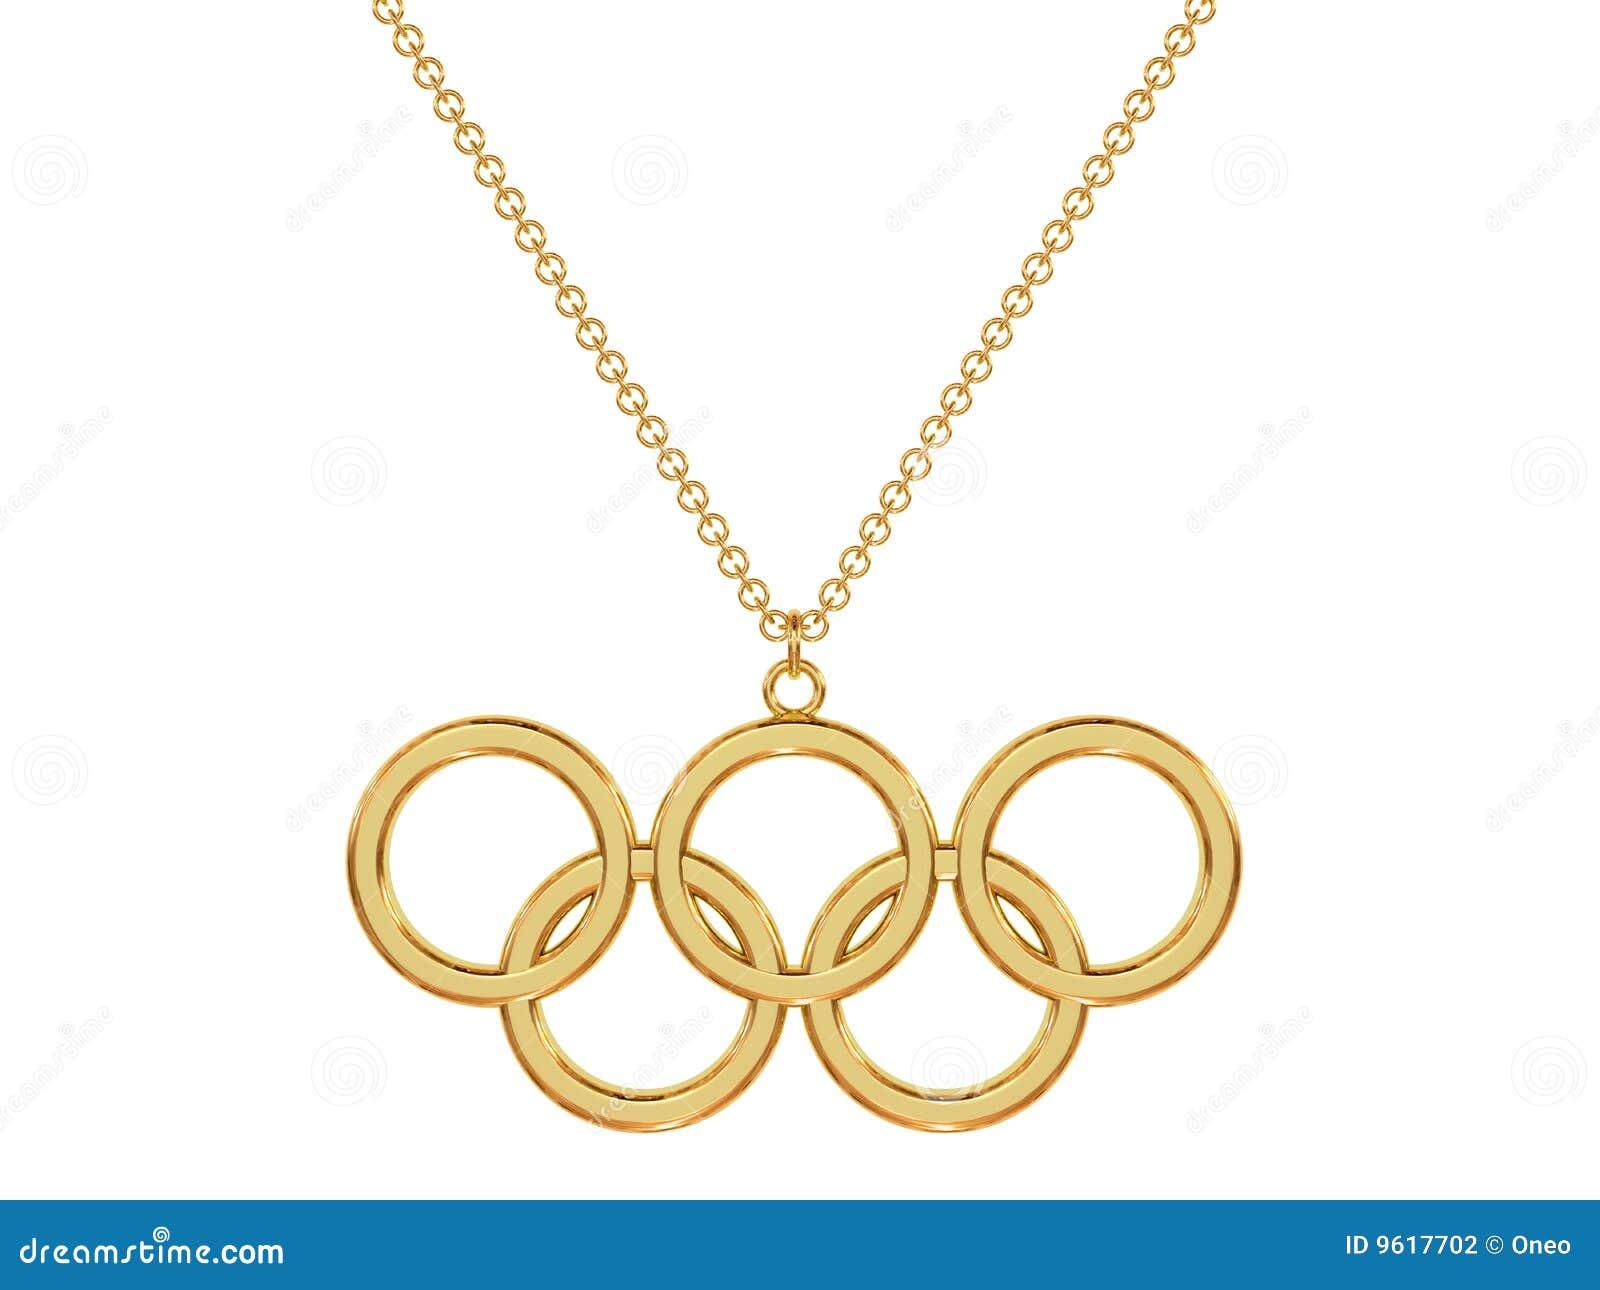 Shiny Olympic Rings